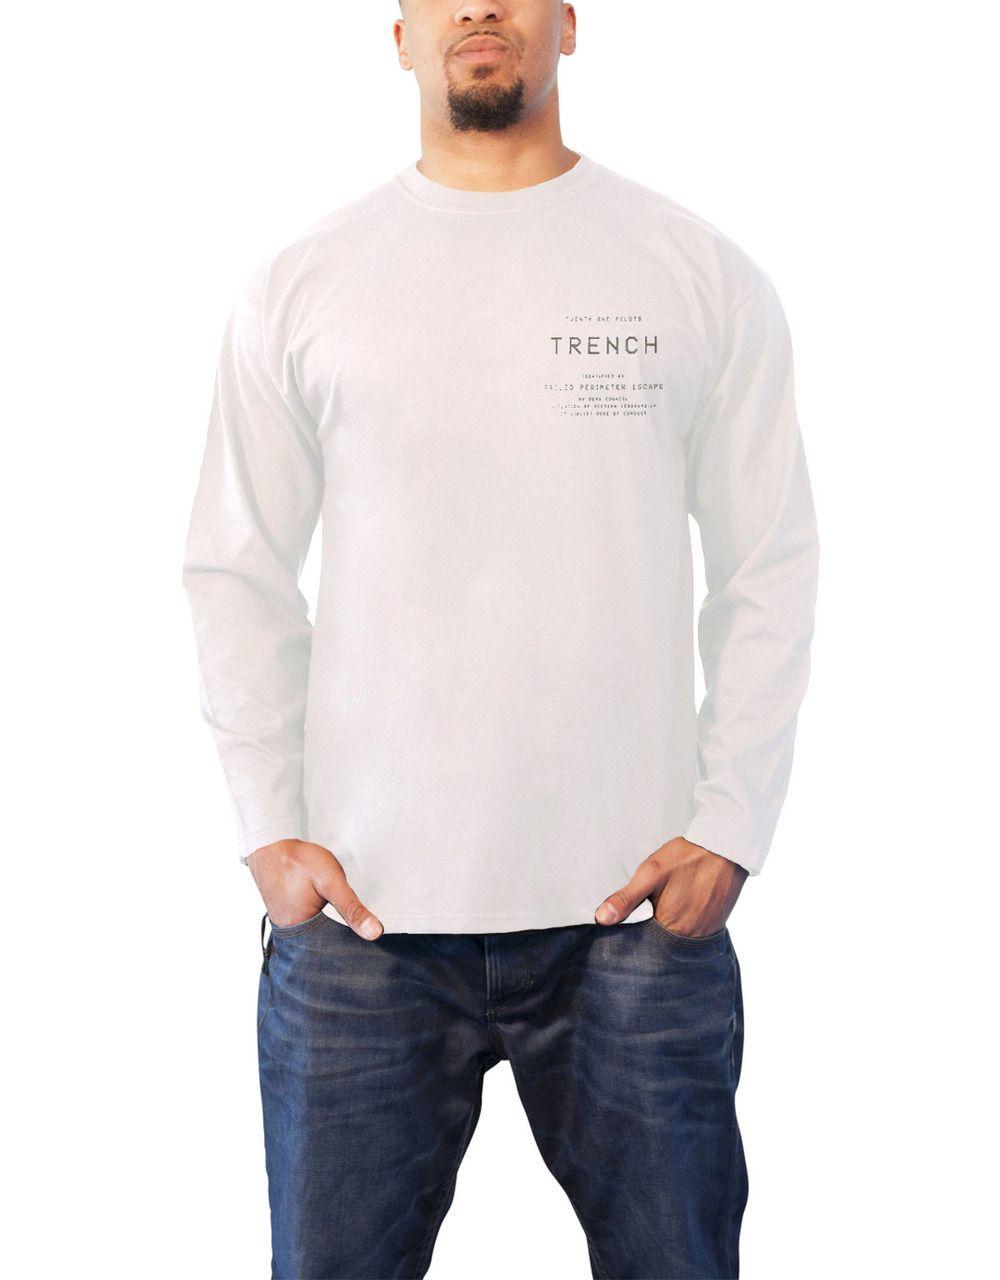 e961e2bcd Twenty One Pilots T Shirt Trench Rose Band Logo Mens White Long Sleeve - Paradiso  Clothing